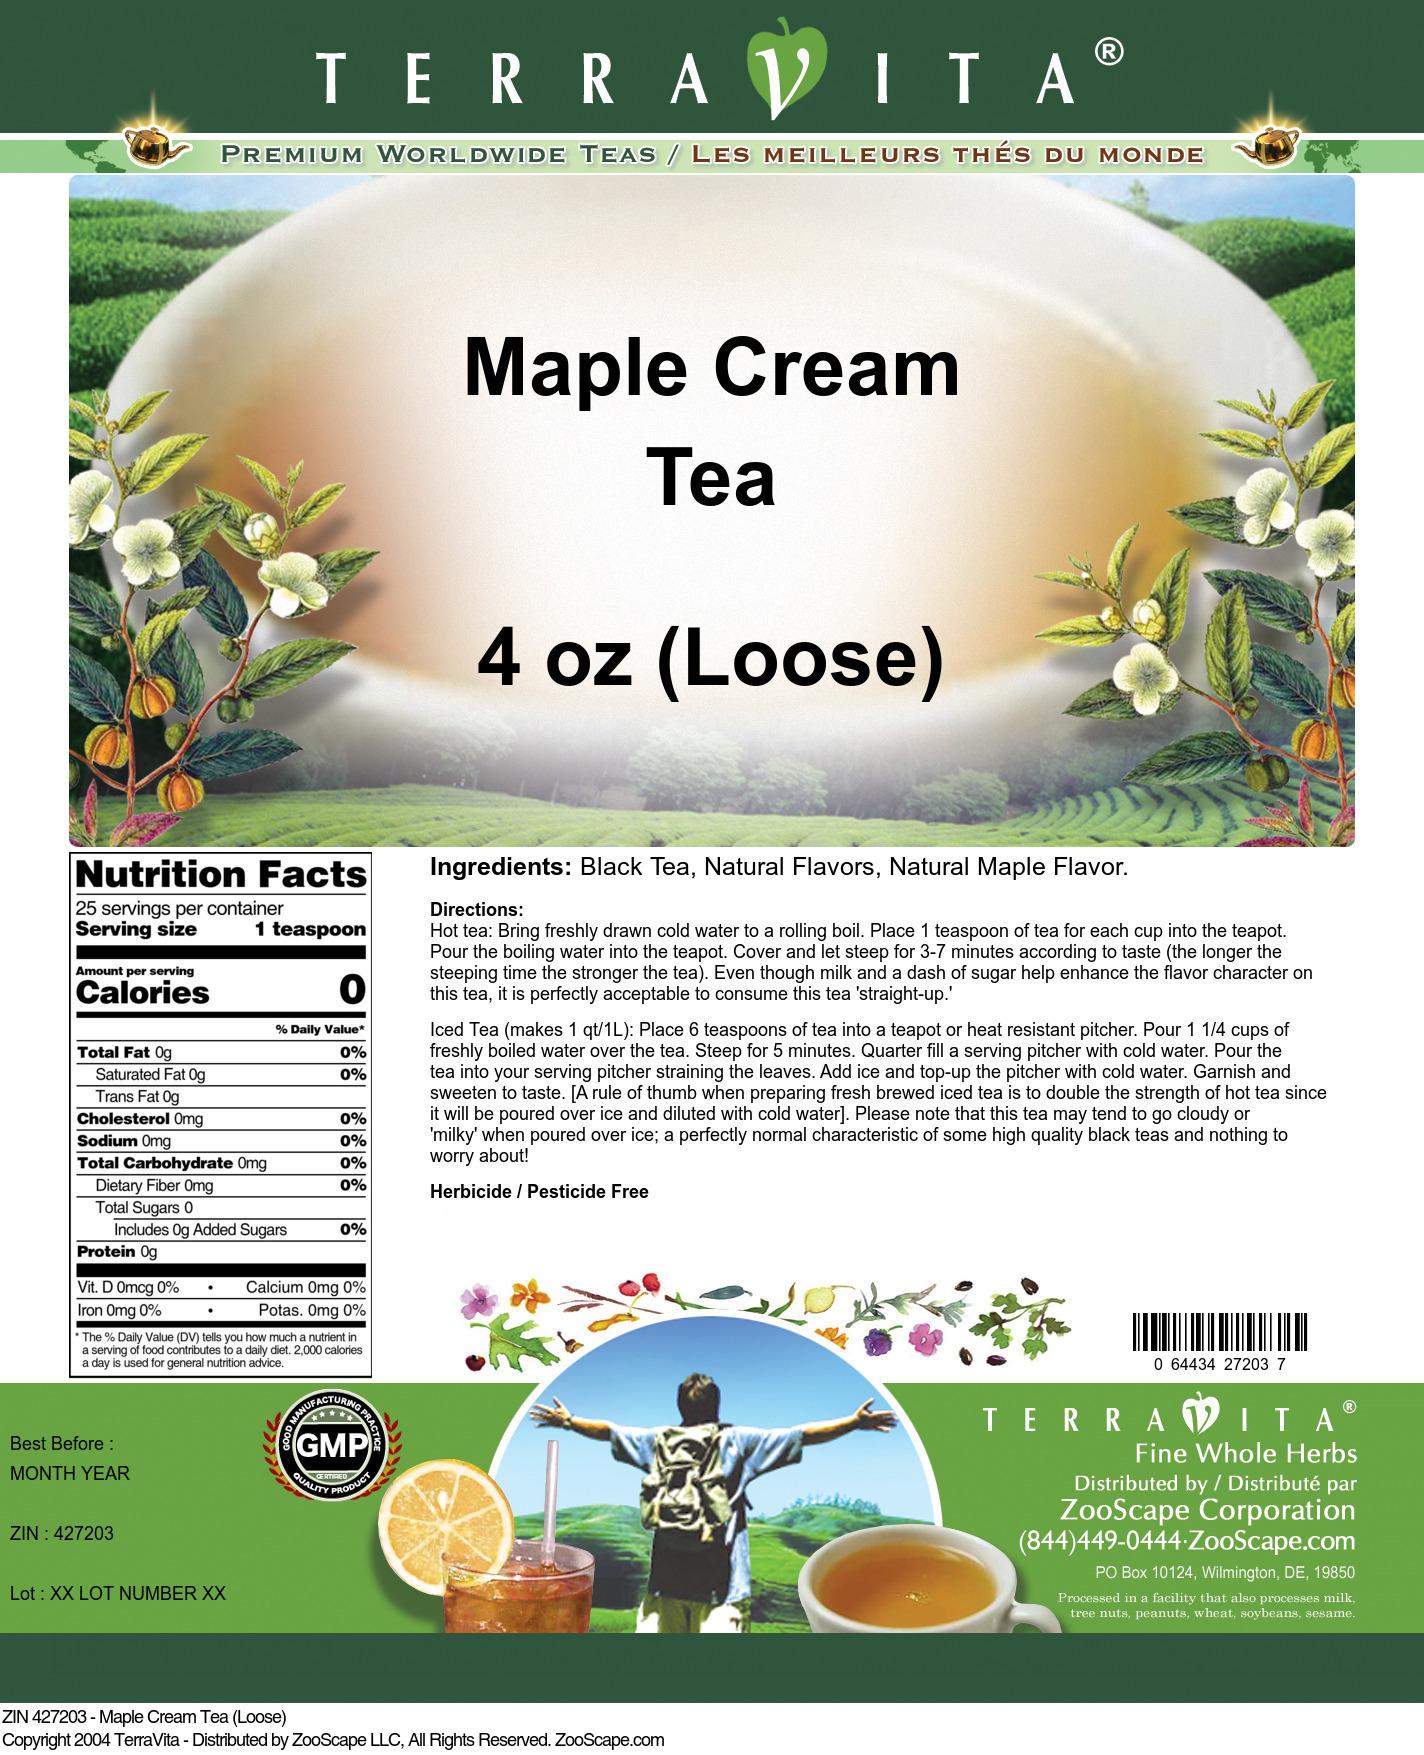 Maple Cream Tea (Loose)